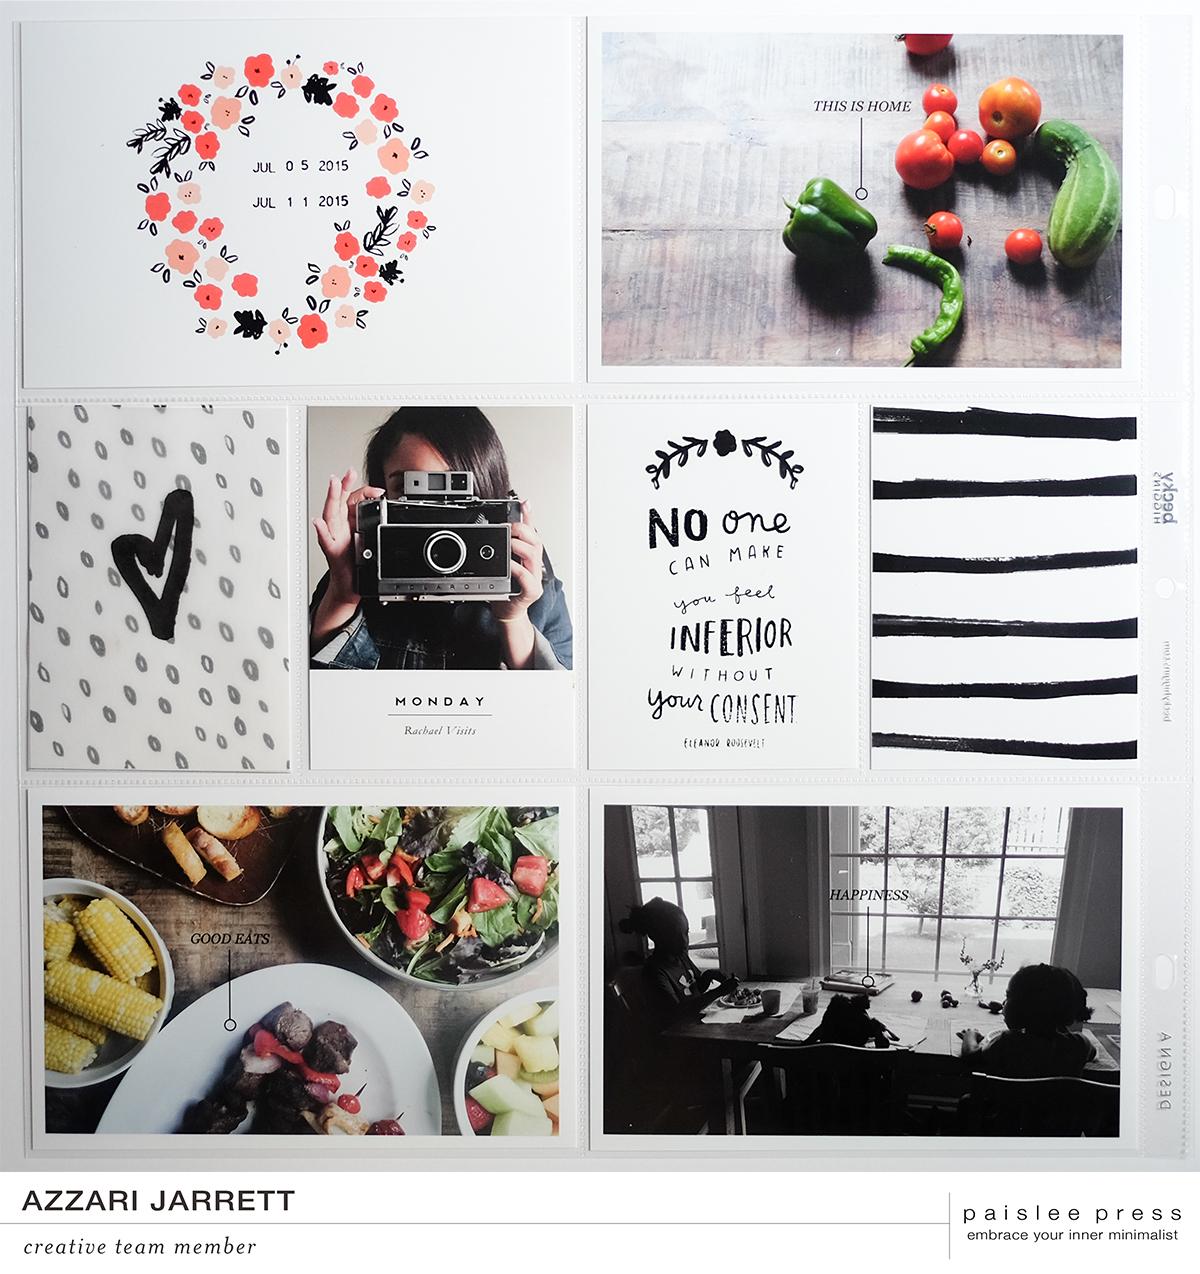 August Layouts with Paislee Press by Azzari Jarrett